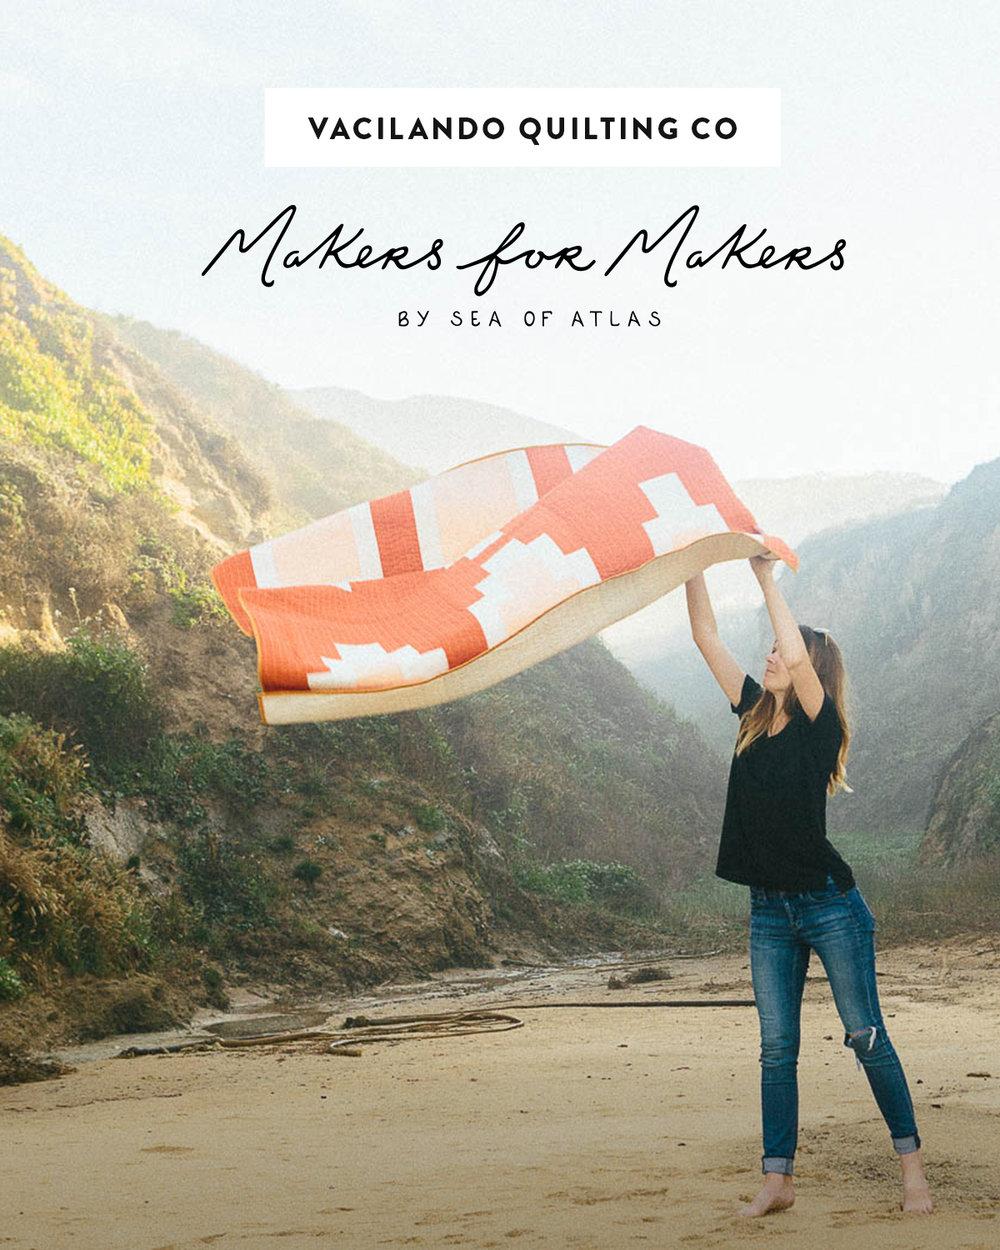 Makers for Makers: Vacilando Quilting Co | Sea of Atlas